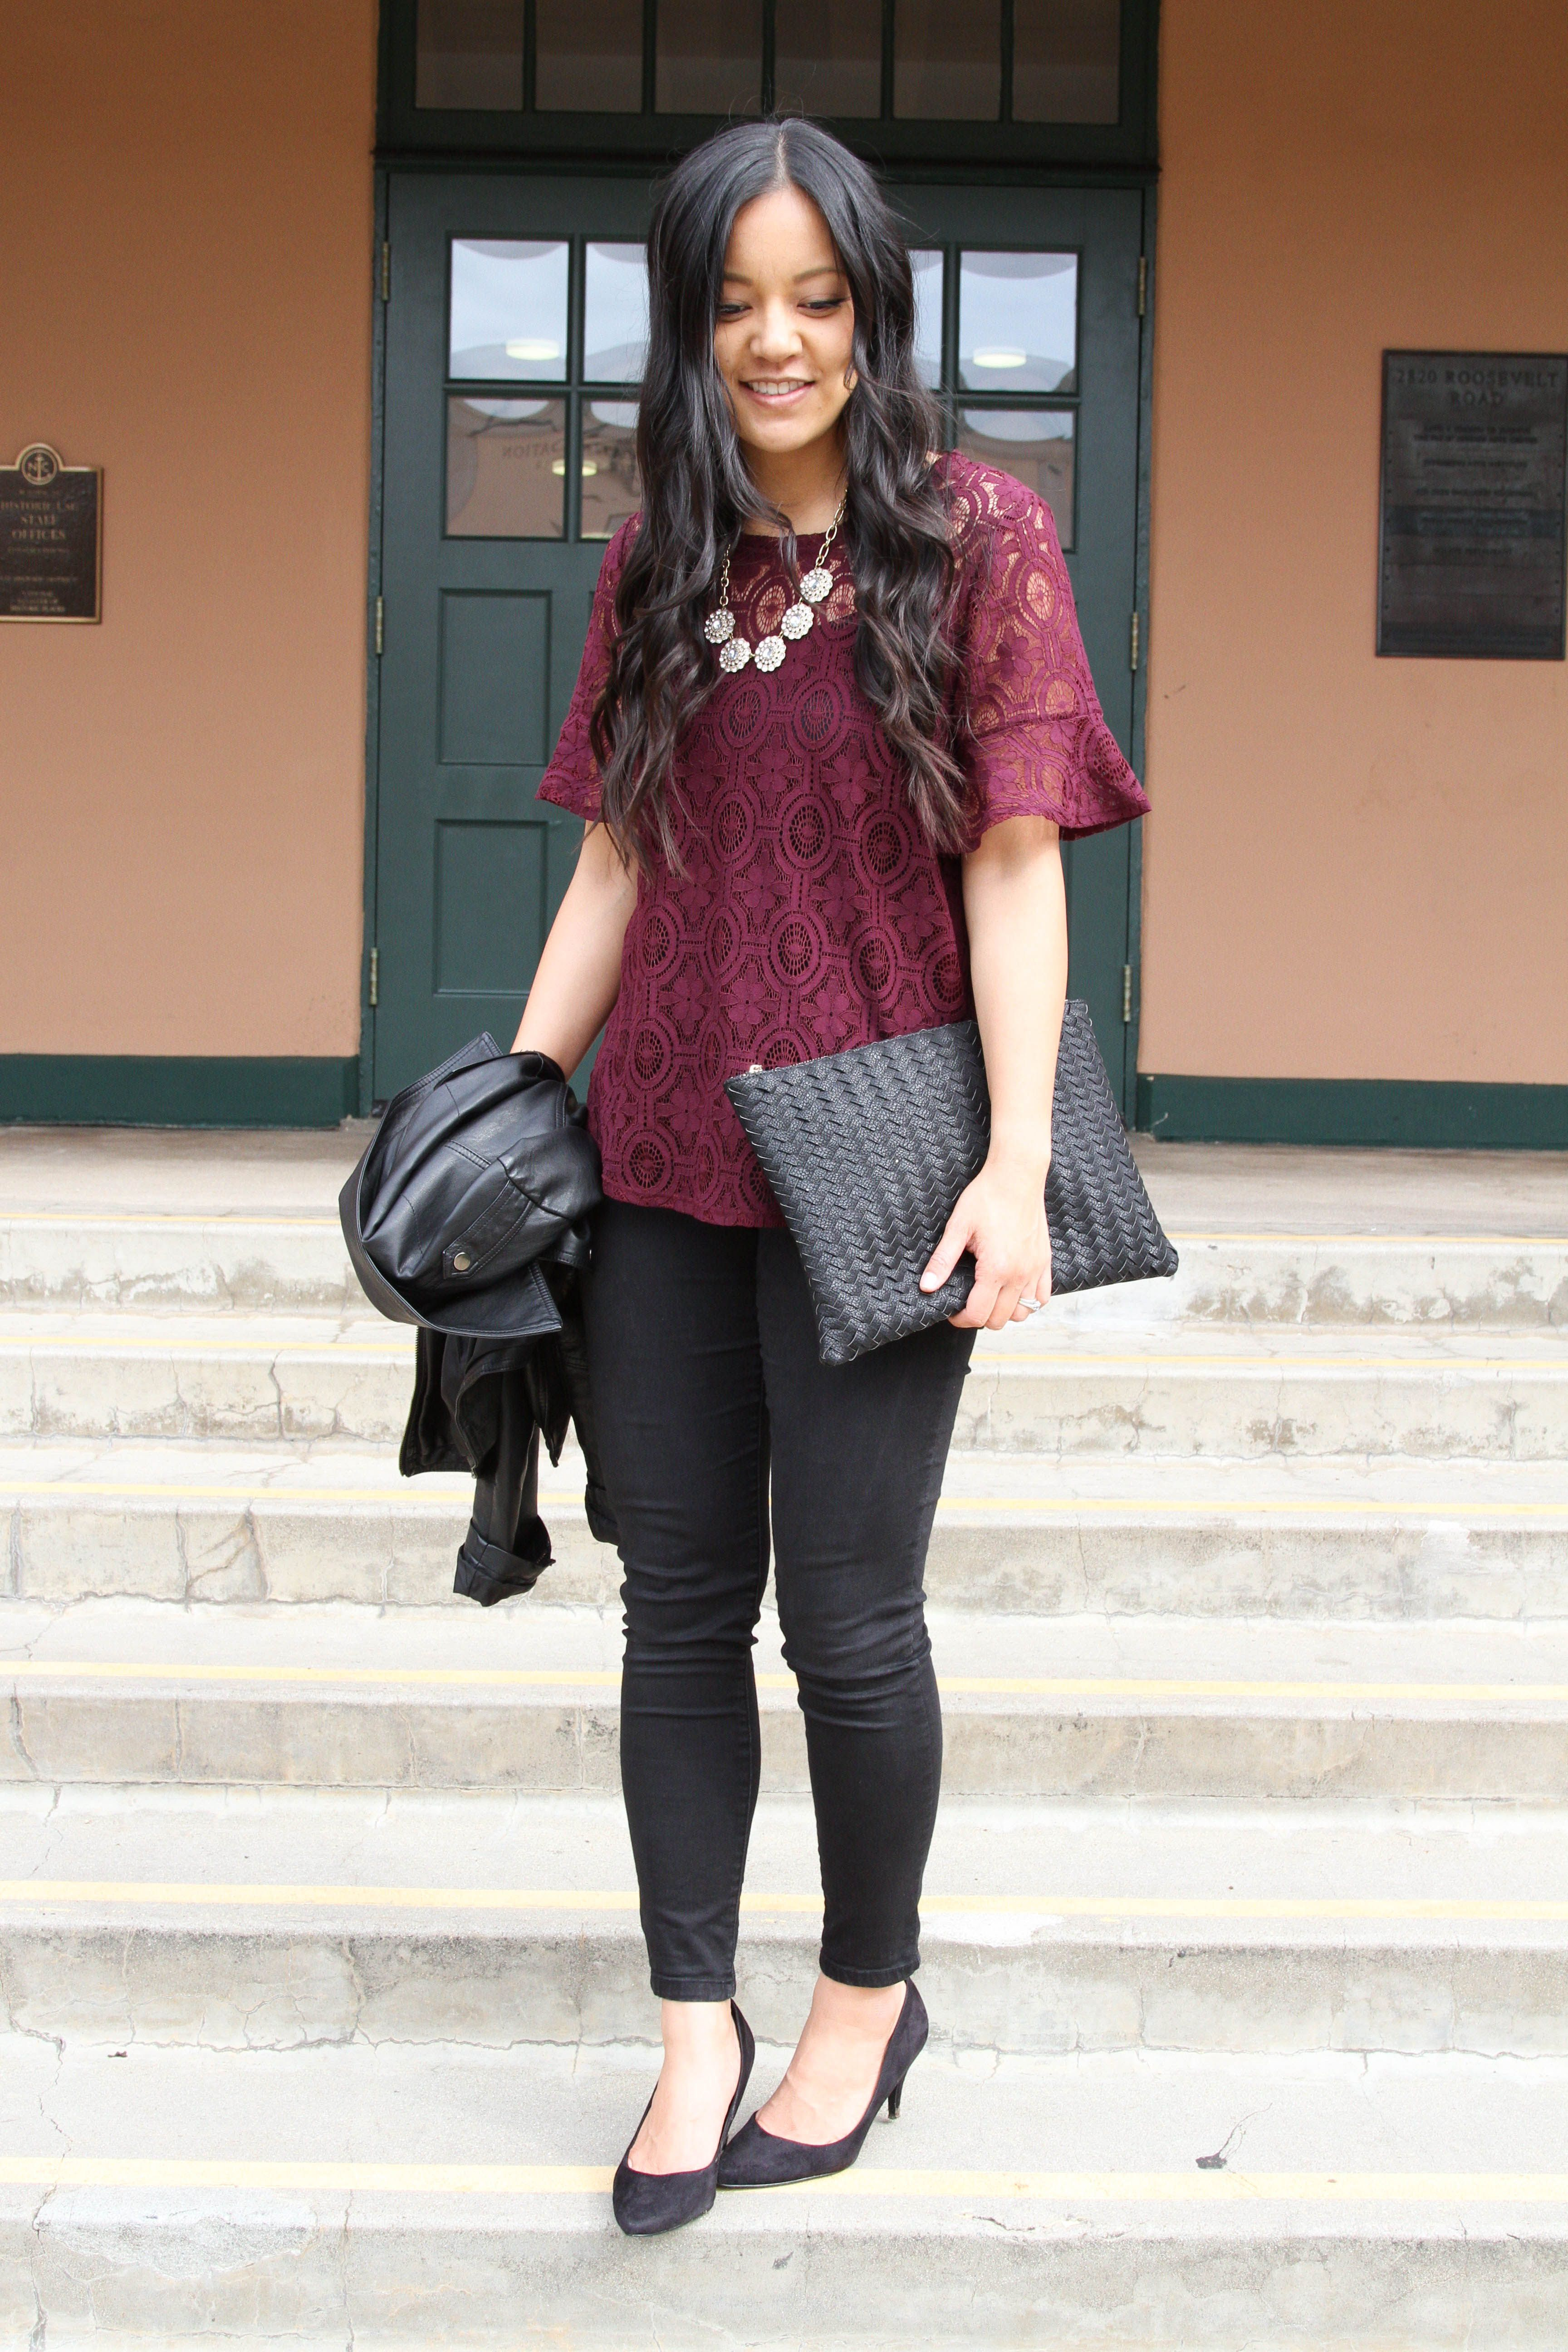 017cc581589 Maroon Lace Blouse + Black Skinnies + Black Clutch + Pumps Black Pants Outfit  Dressy